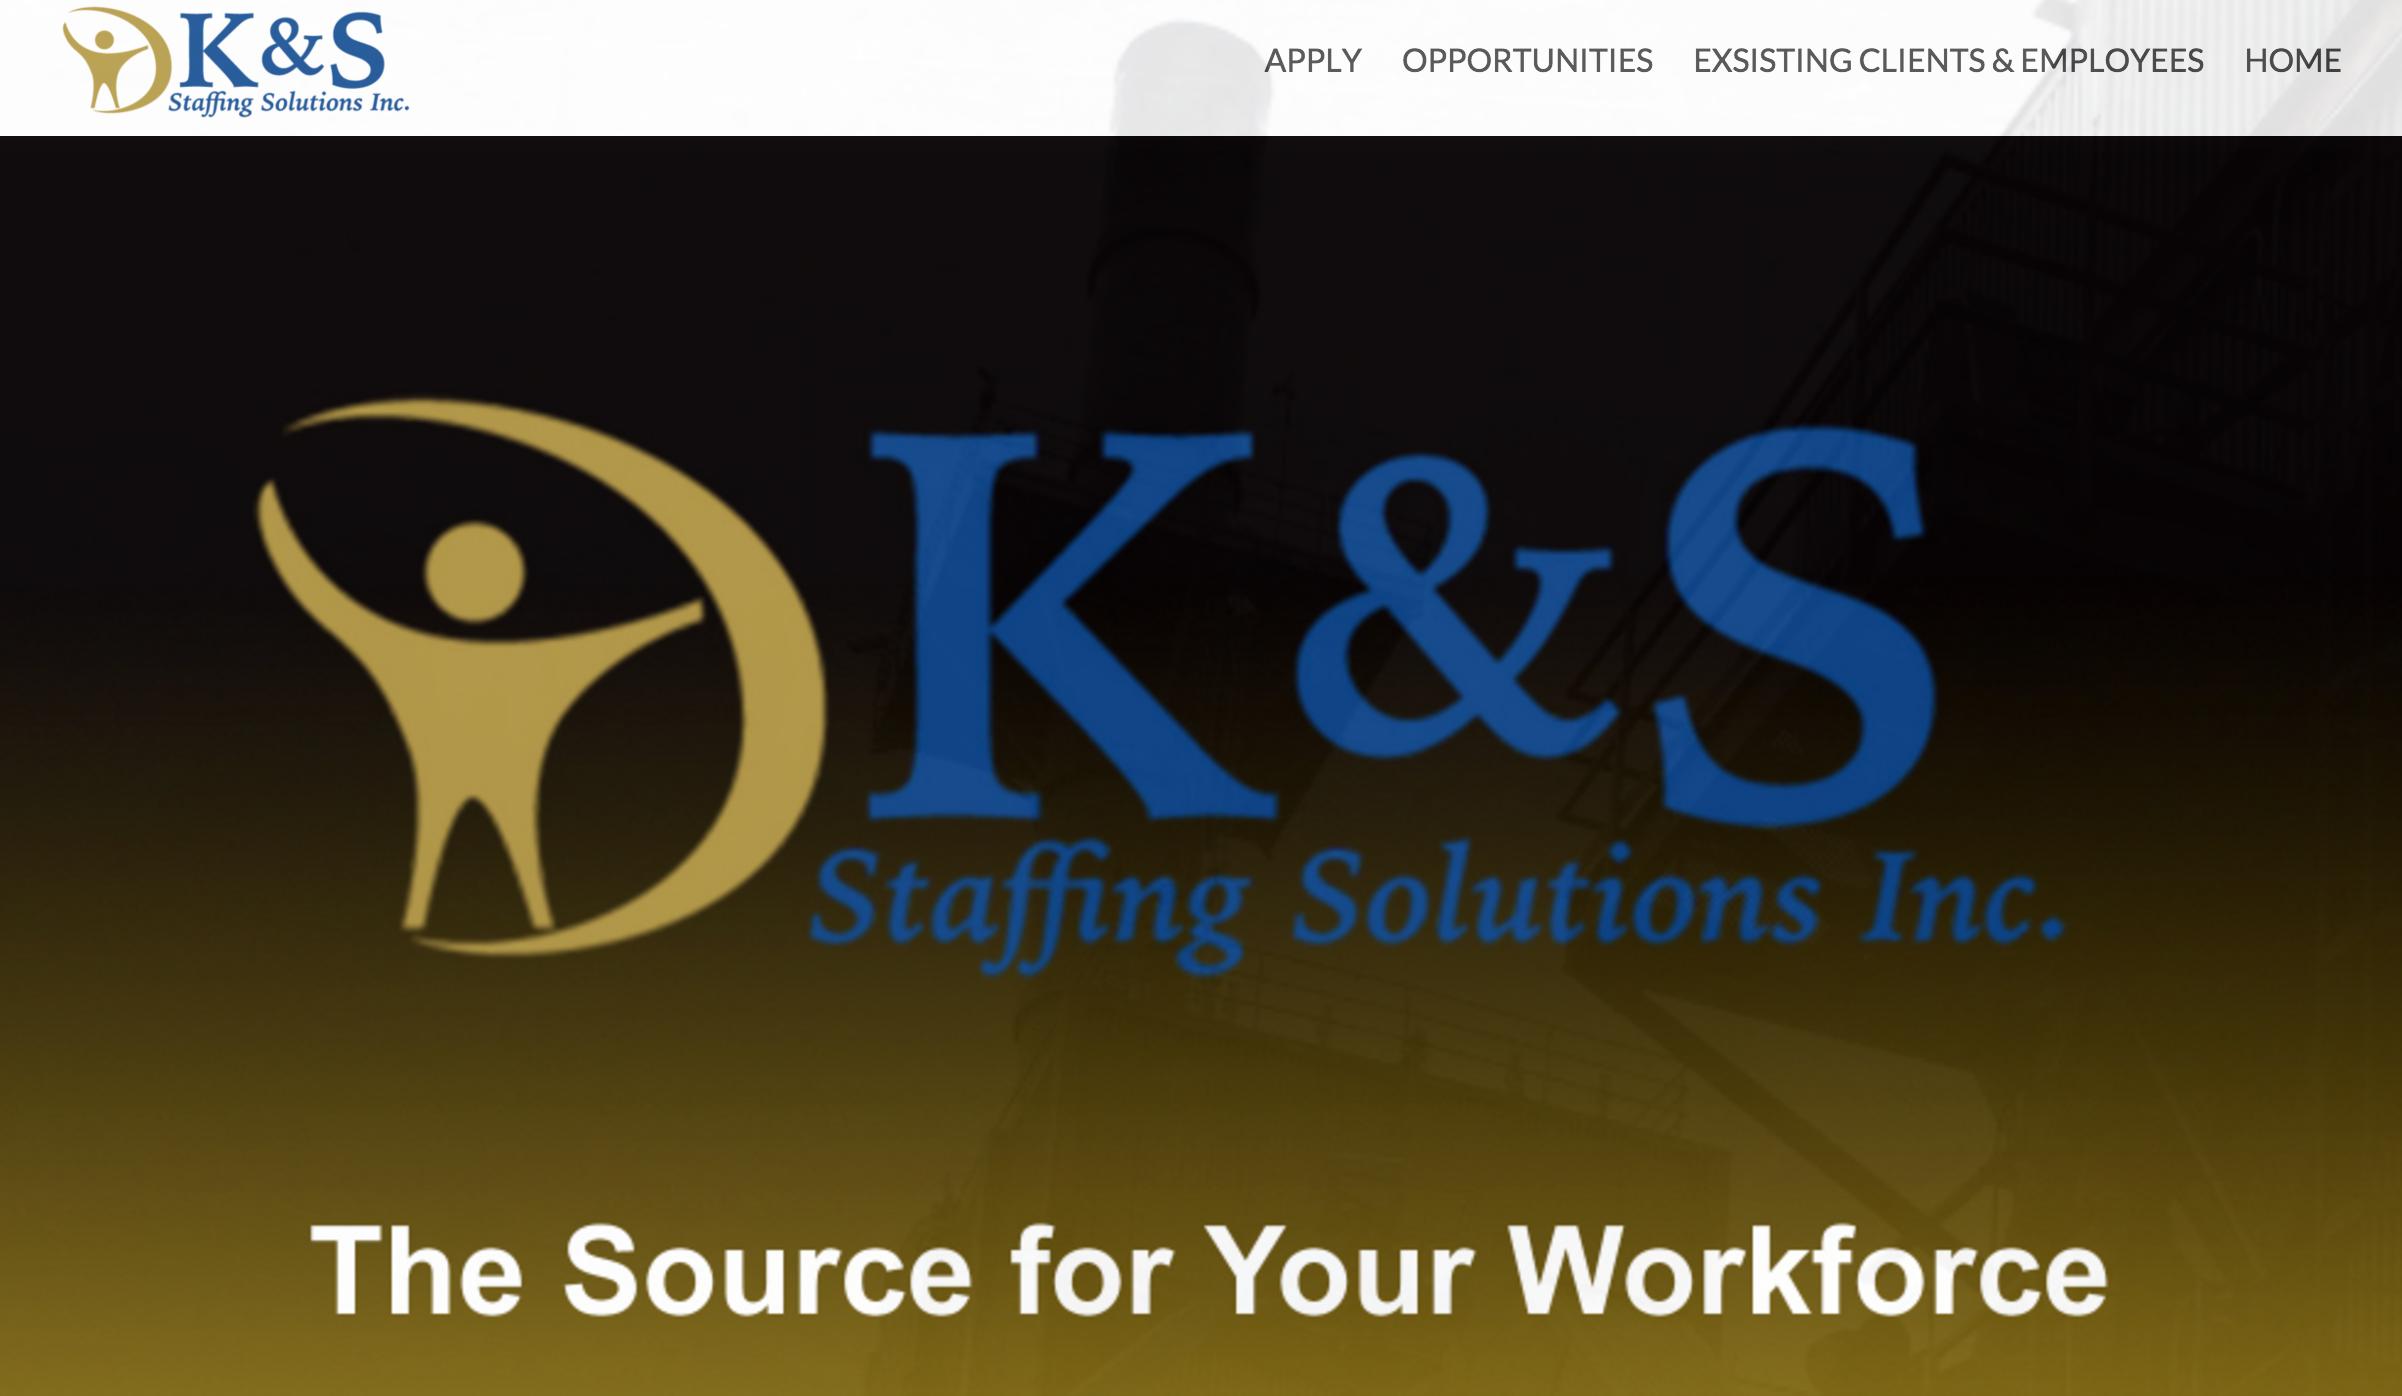 K&S Staffing